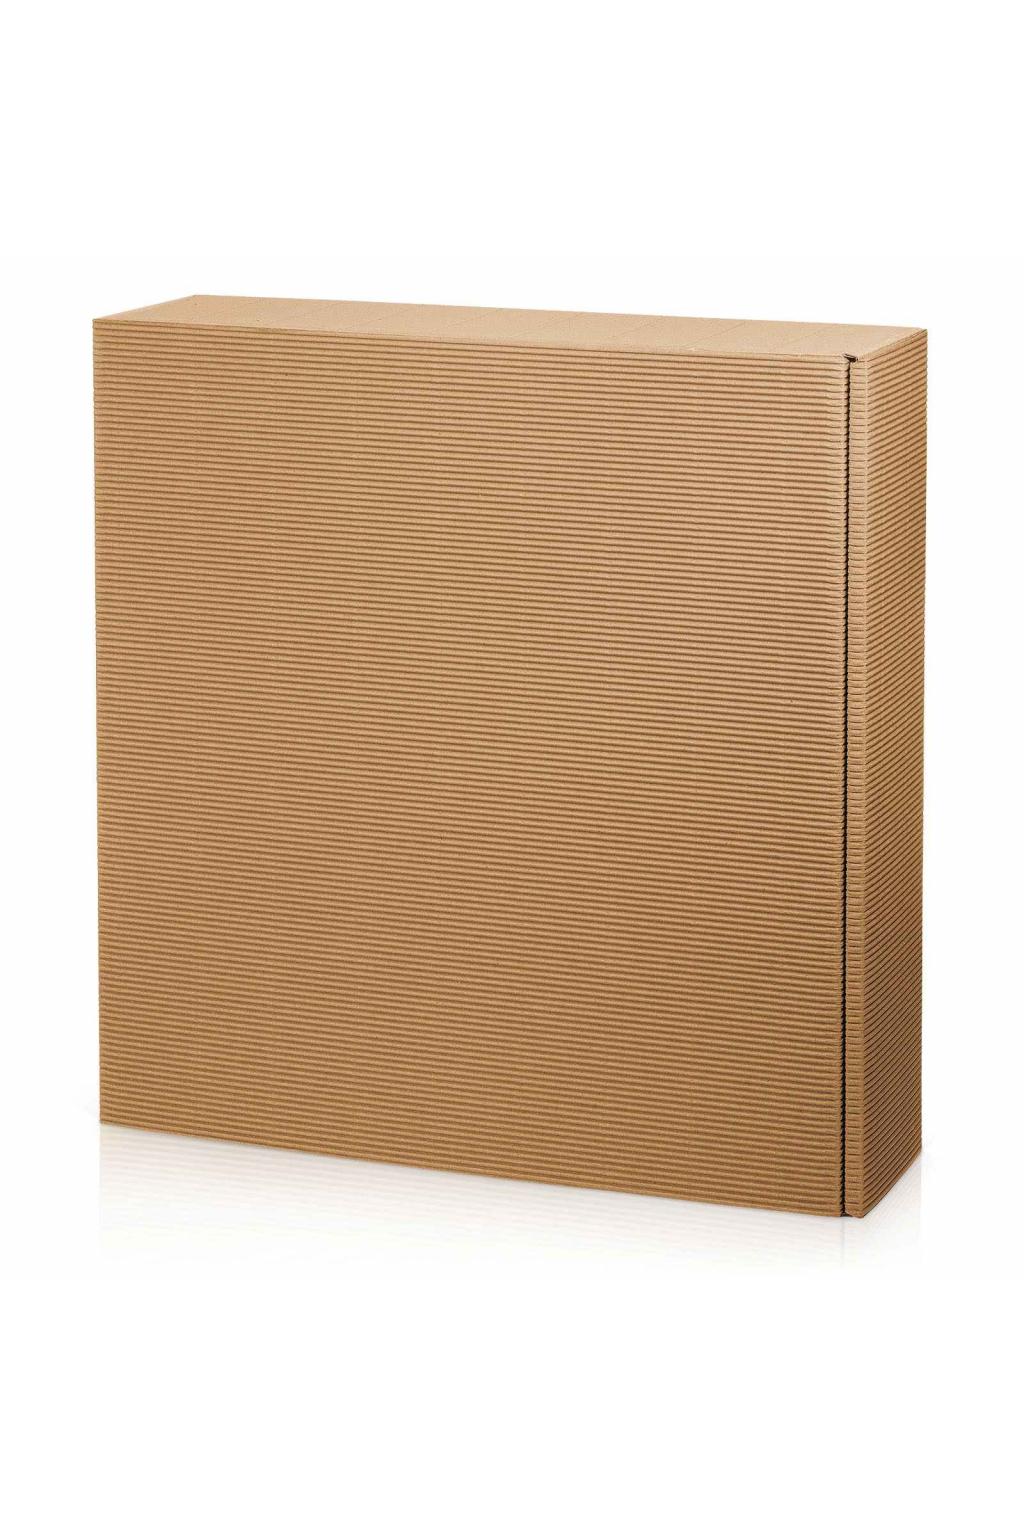 krabicka prirodni 4 lahve web